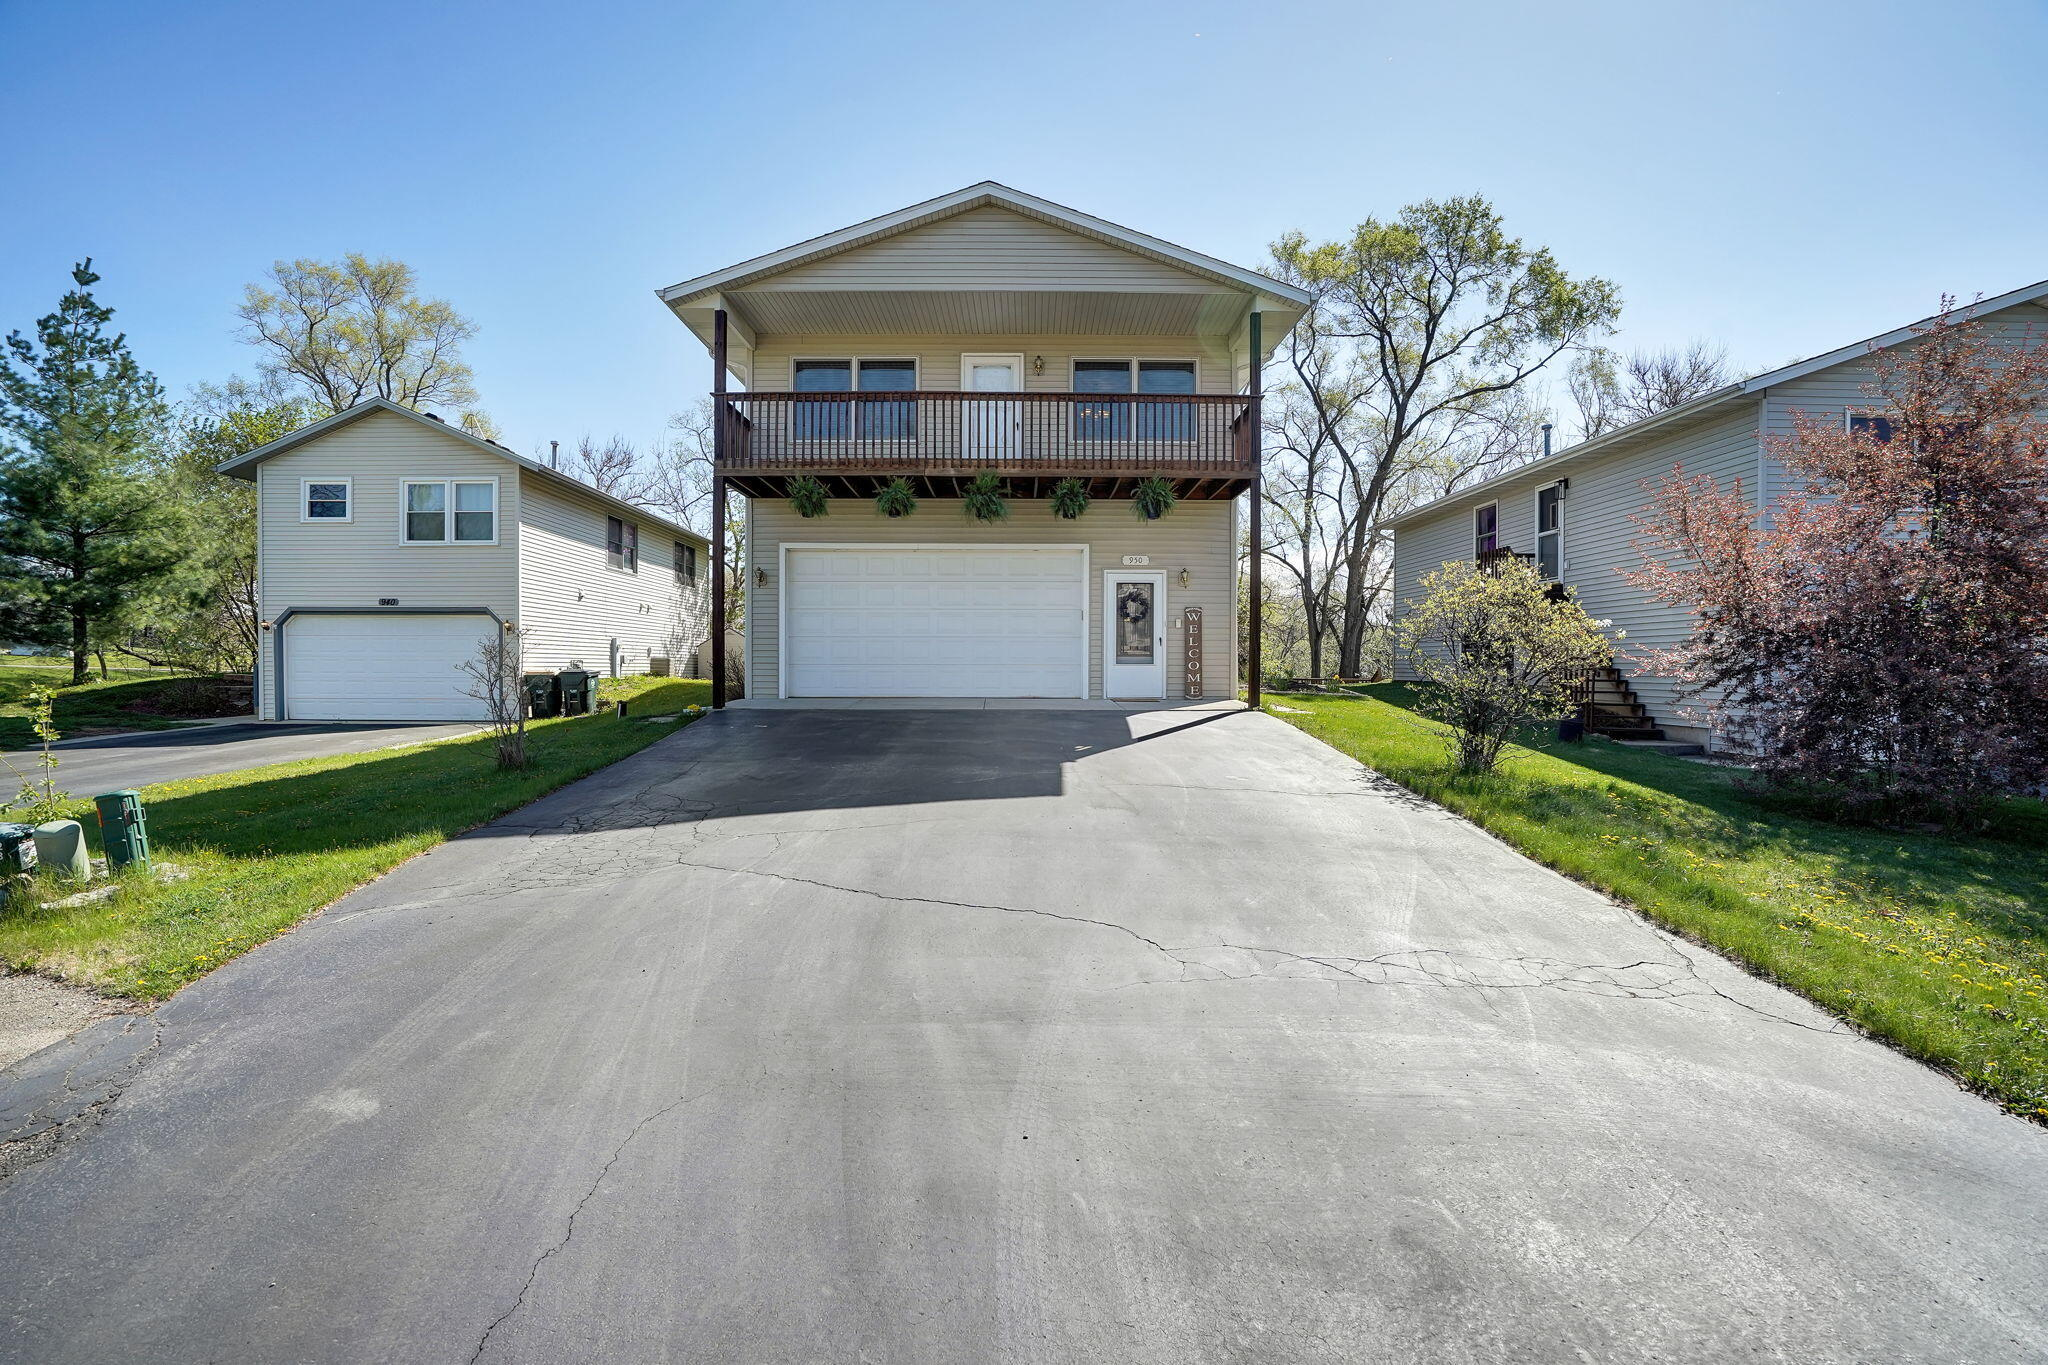 950 Rhyners Ln Twin Lakes, WI 53181 Property Image